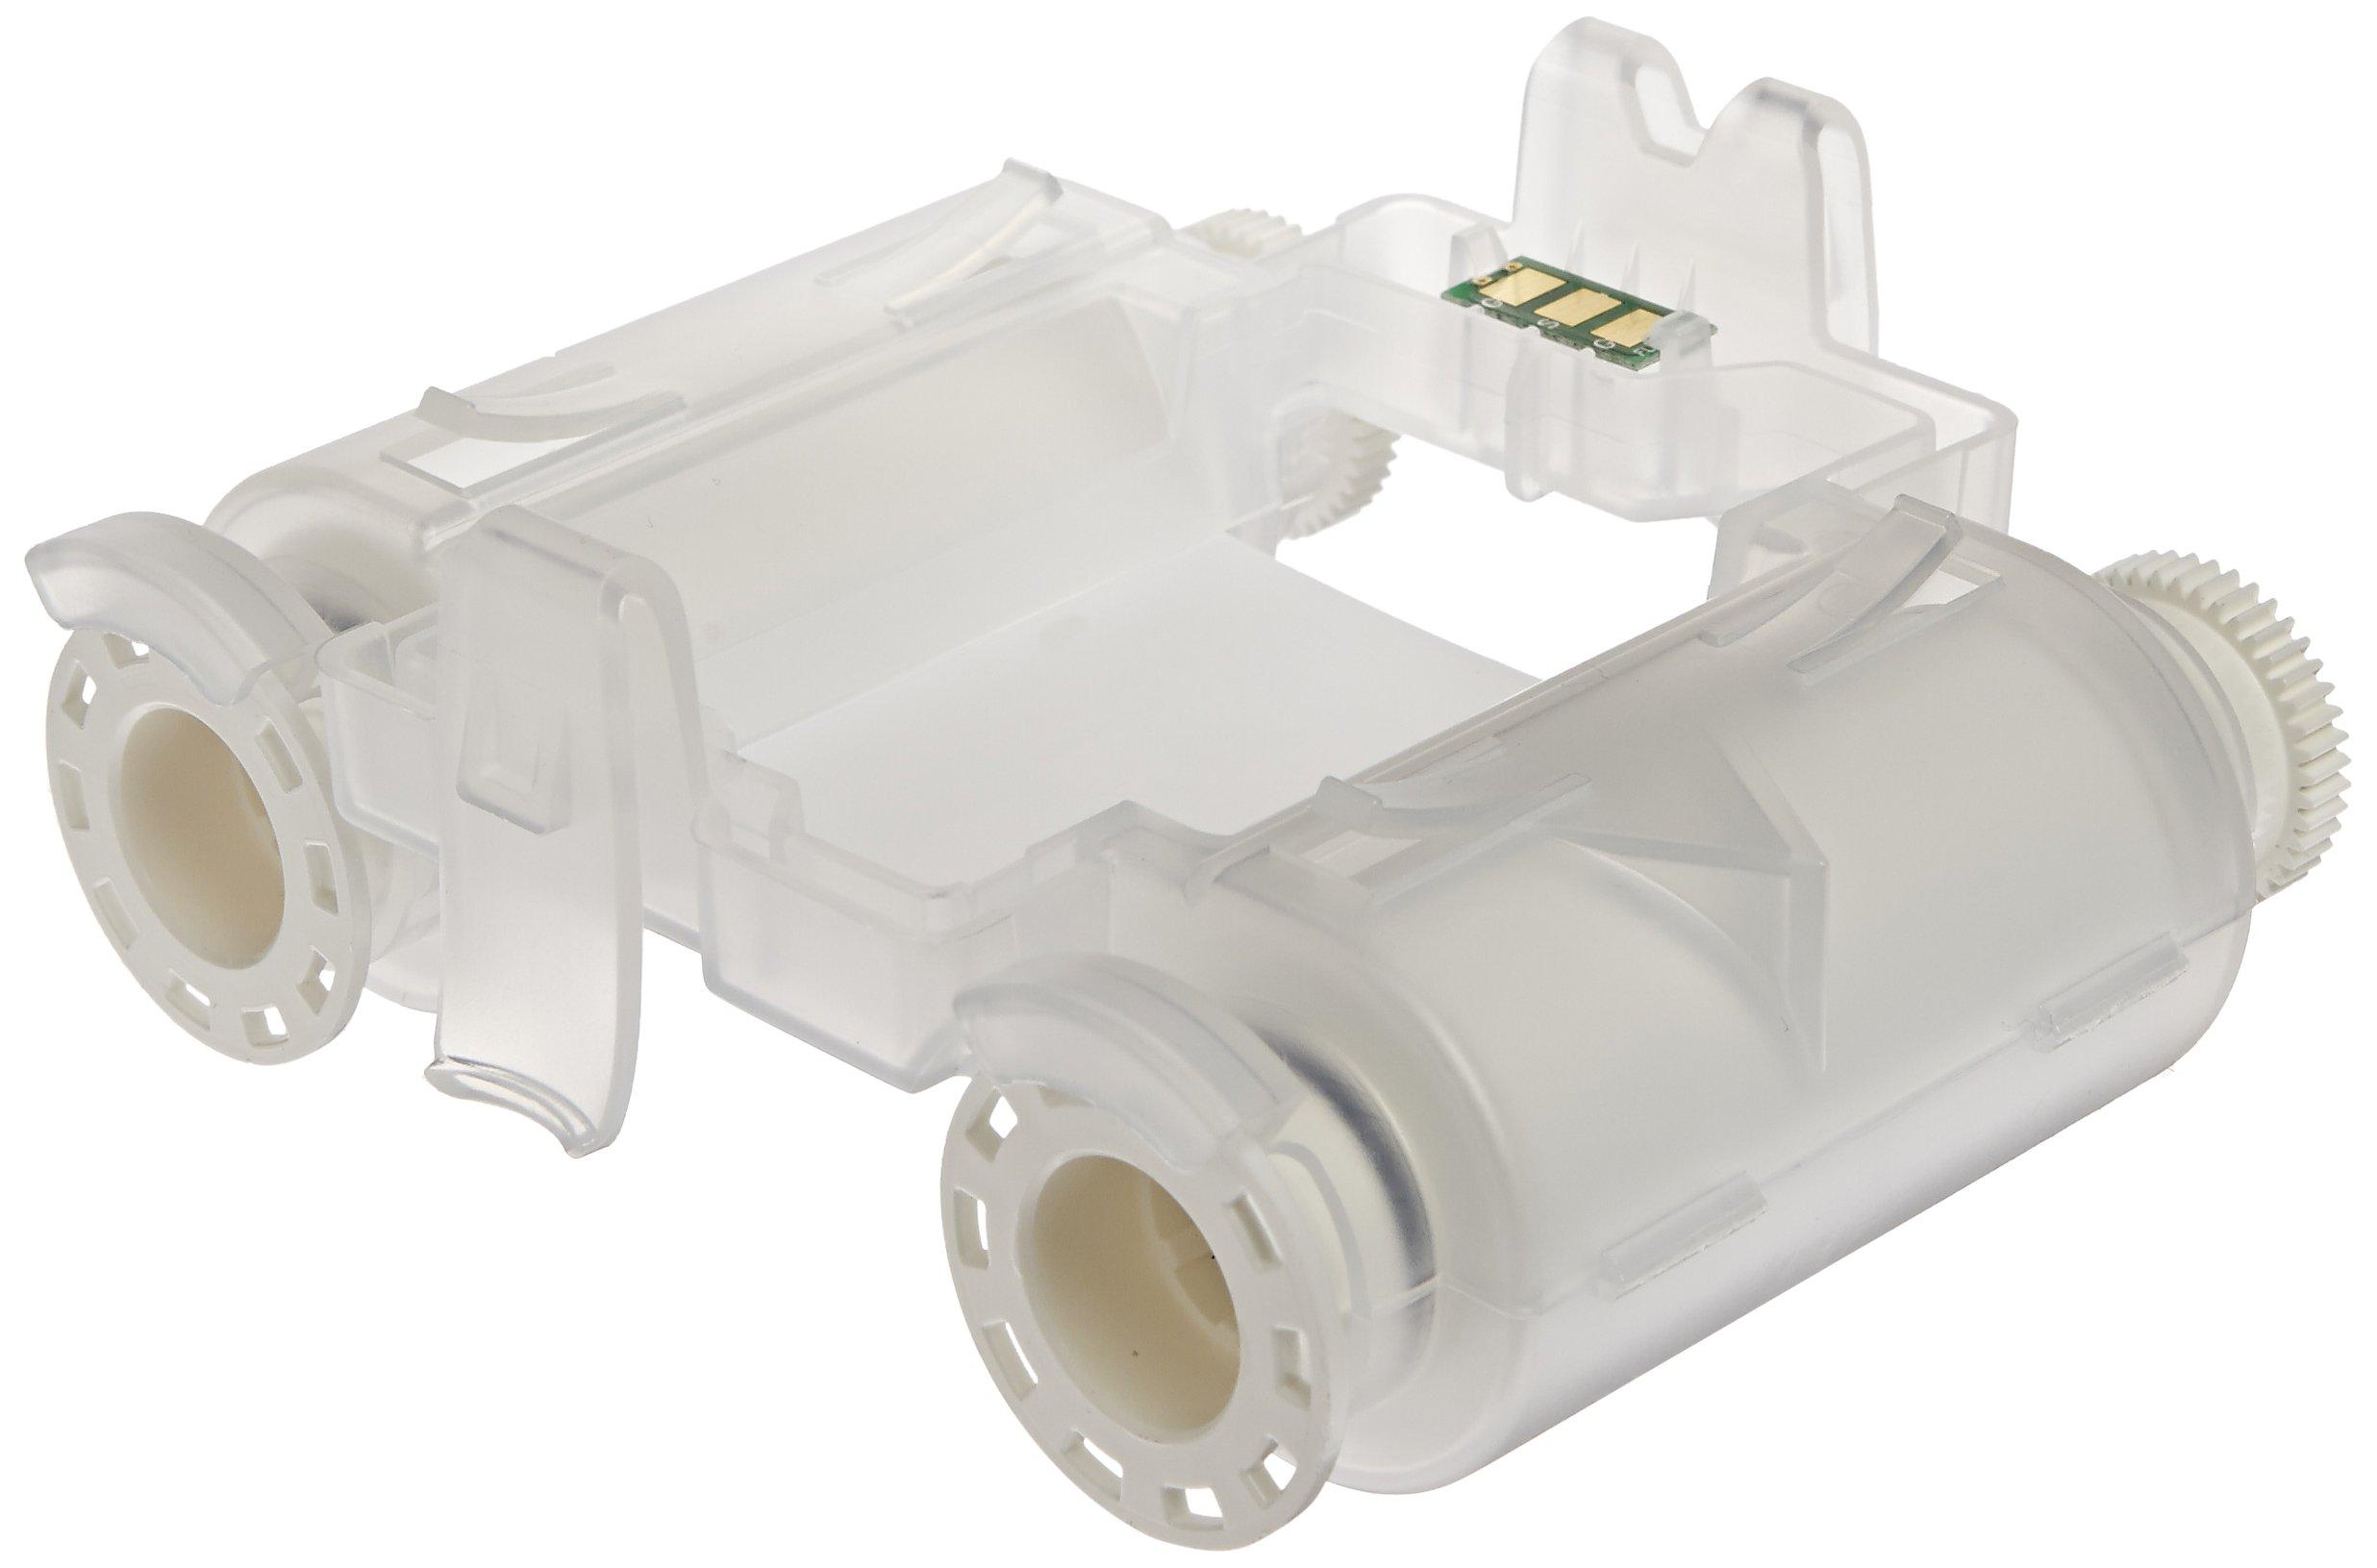 Brady M71-R4400-WT White 4400 Series Thermal Transfer Printer Ribbon For BMP71 Label Printer , White,  2.000'' x 150' (50.80 Mm x 45.72 M)